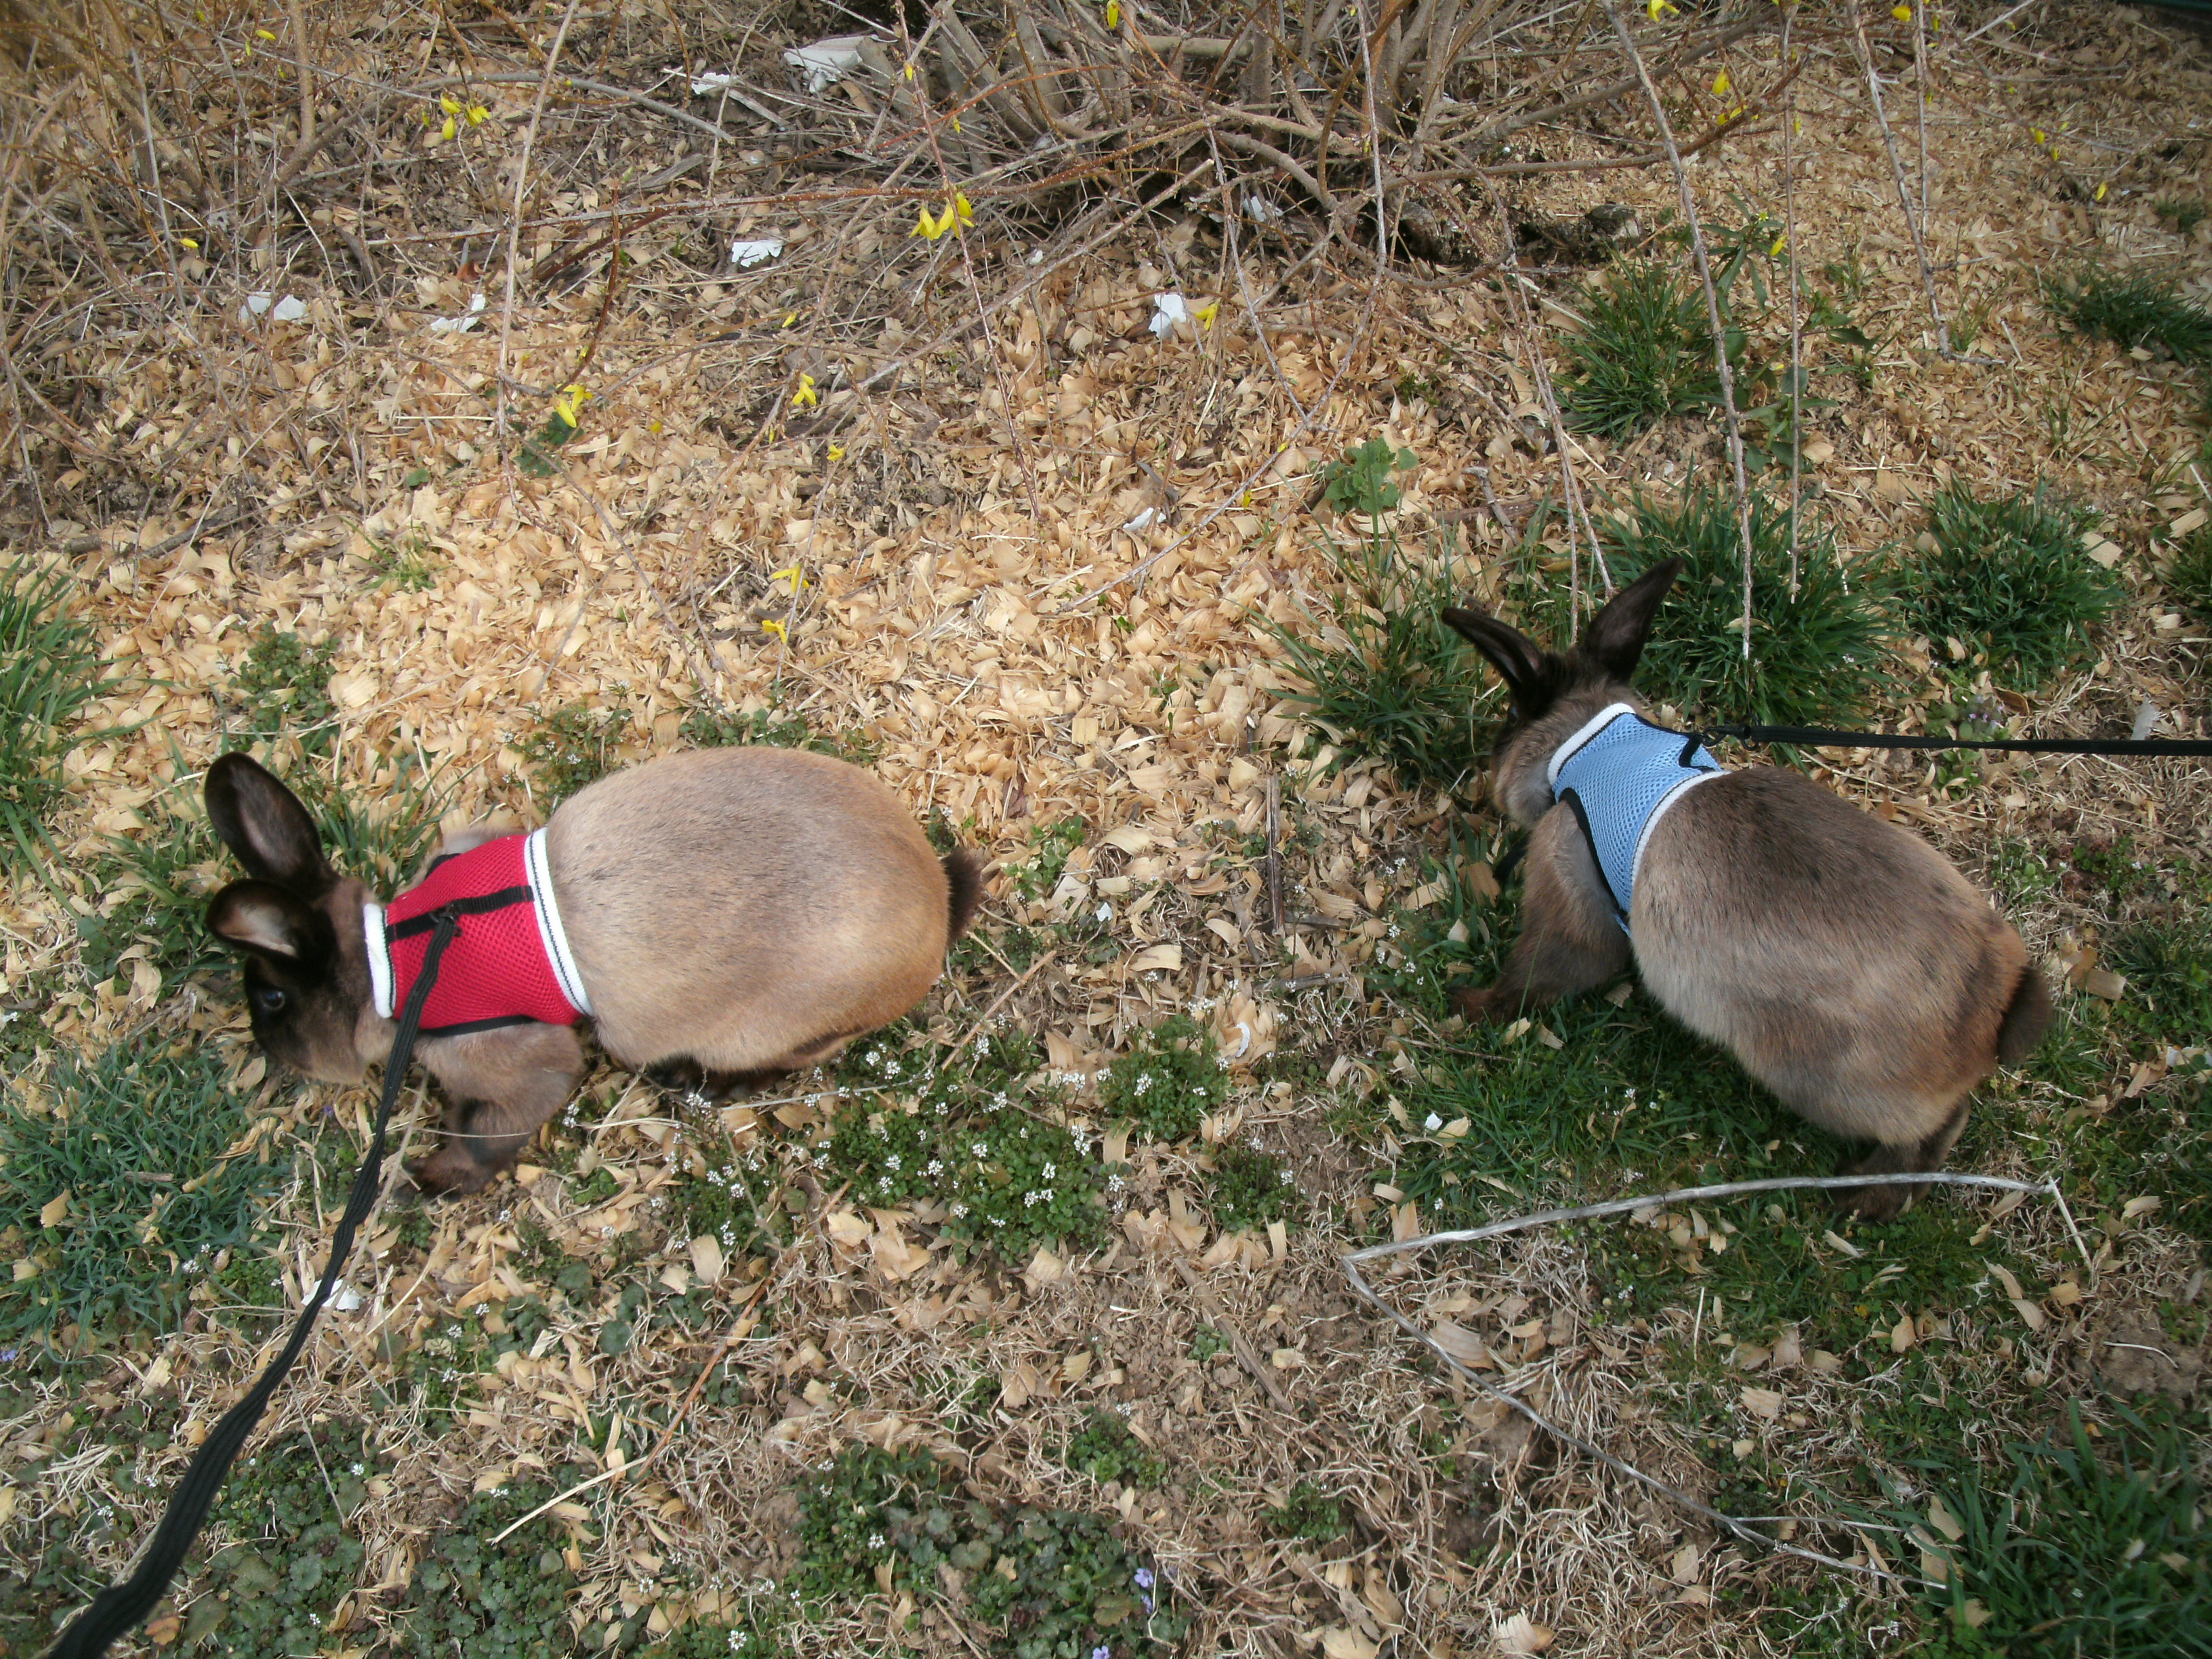 walking rabbits on leashes